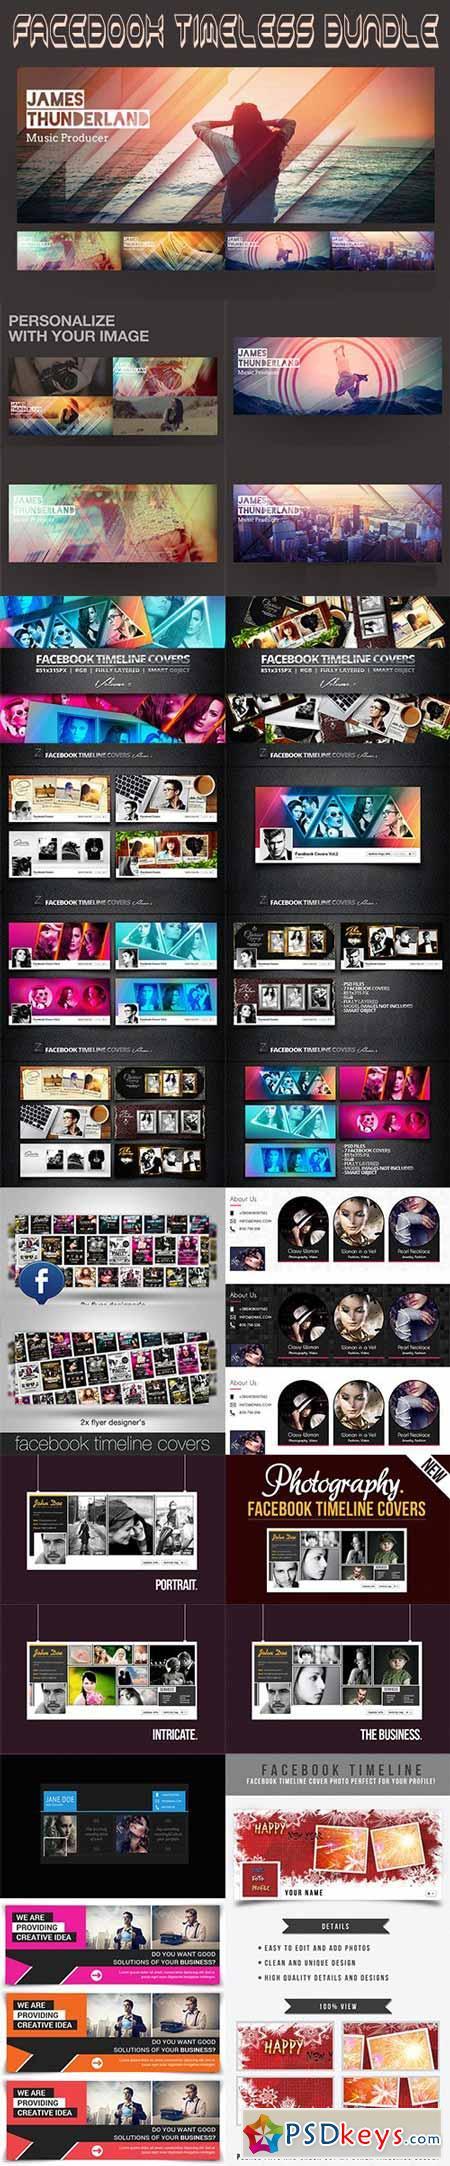 facebook timeline templates bundle free download photoshop